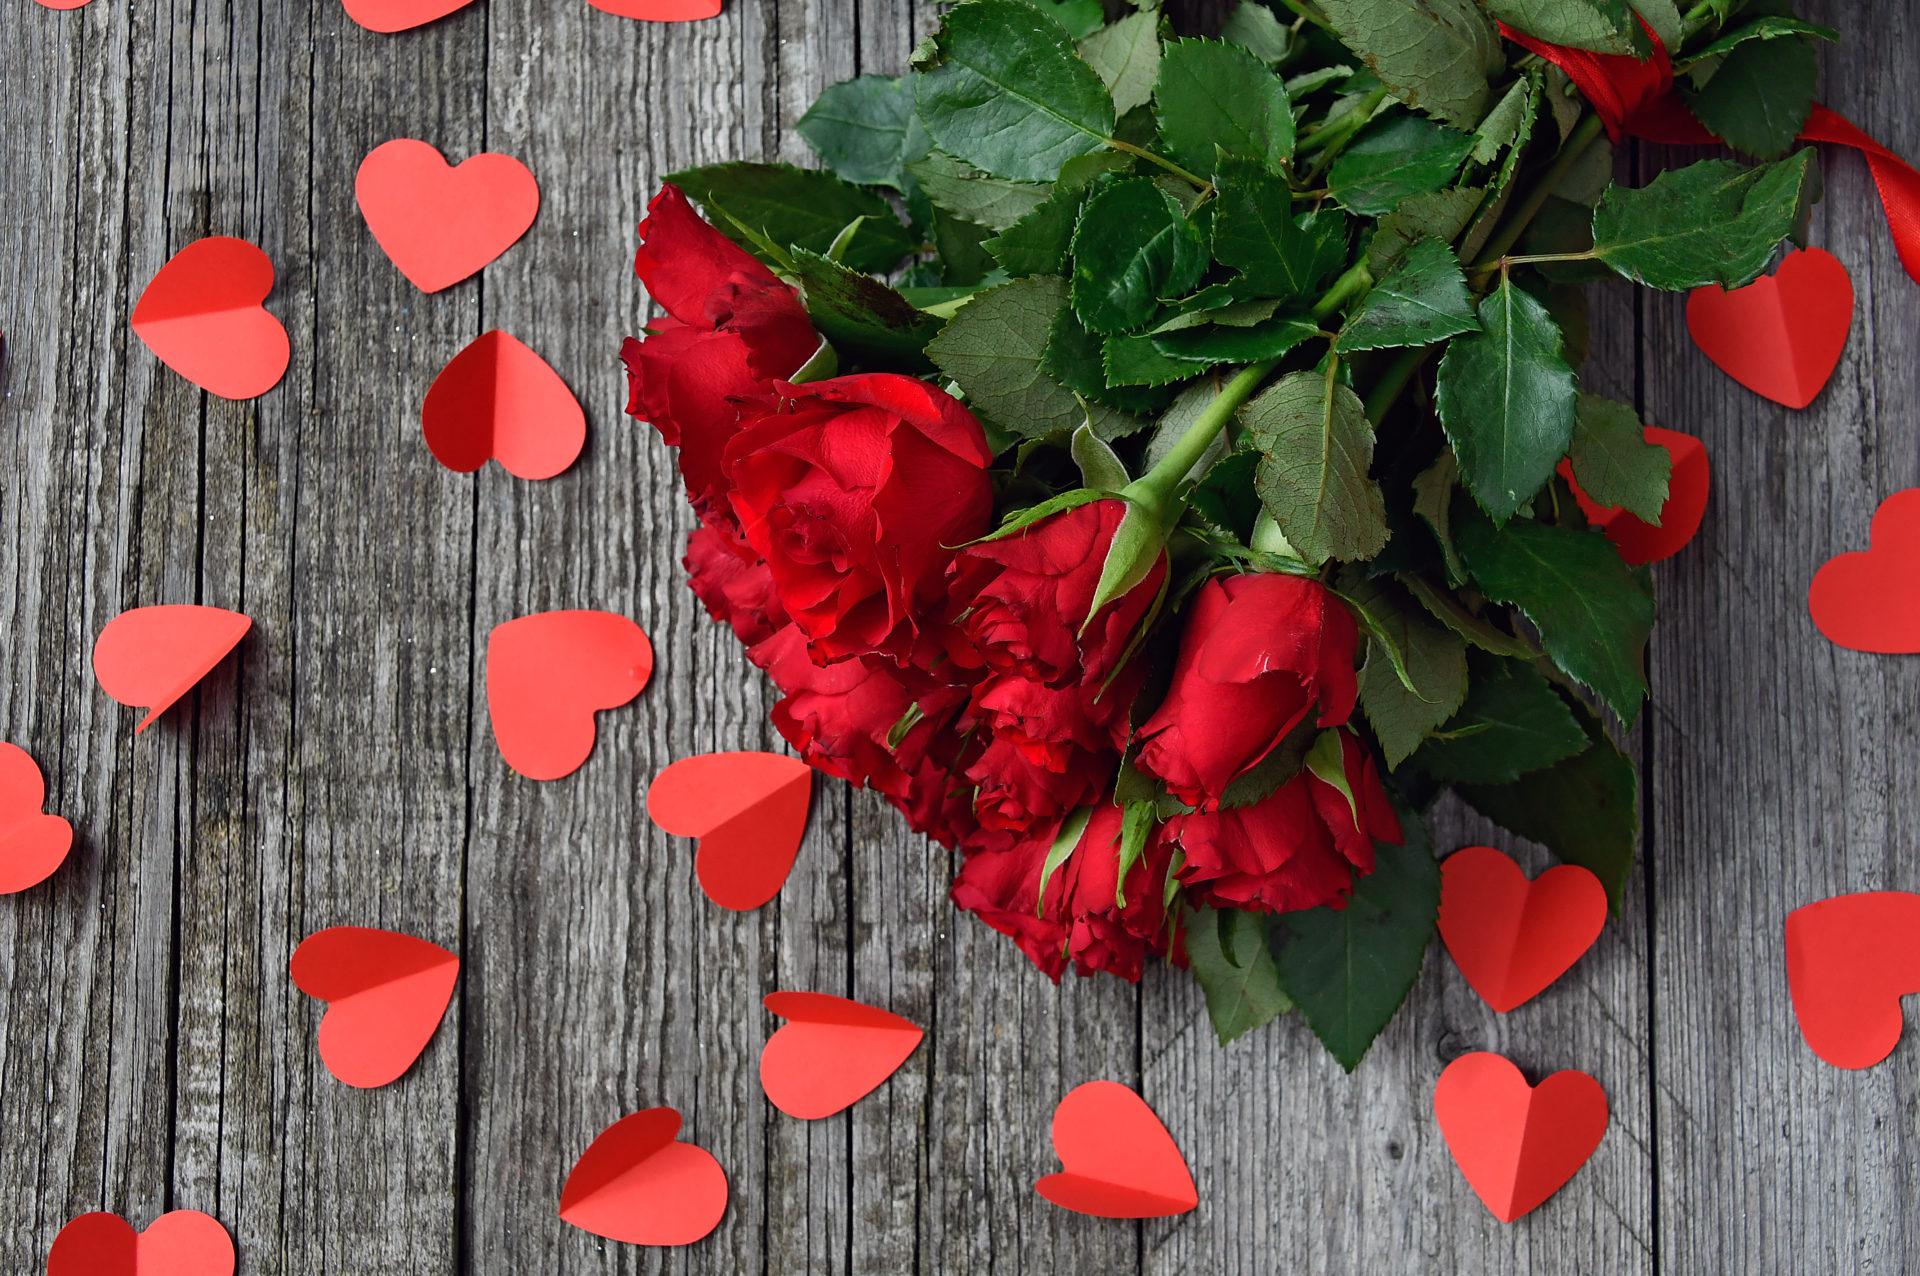 Rose rosse per San Valentino. Pescia: mercato in salute grazie ...